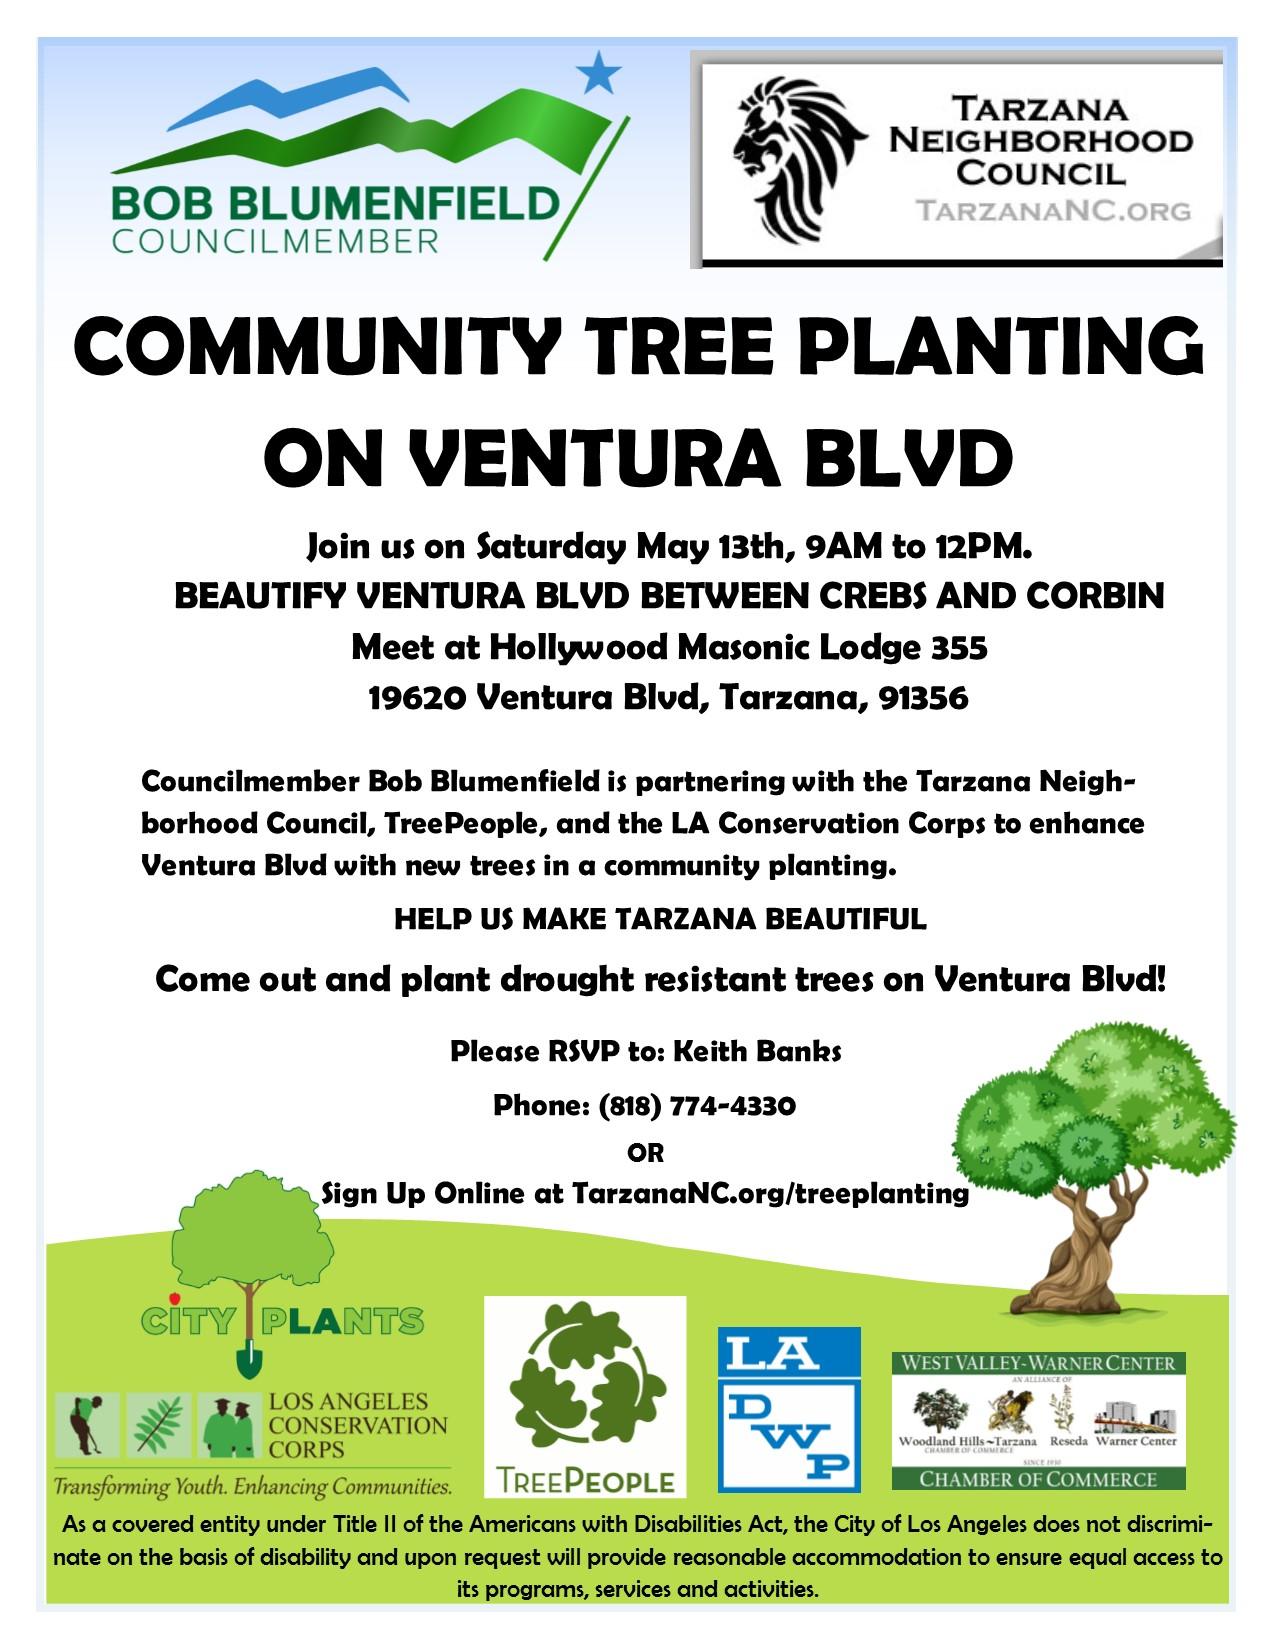 Tarzana_Community_Tree_Planting_5.13.17.jpg